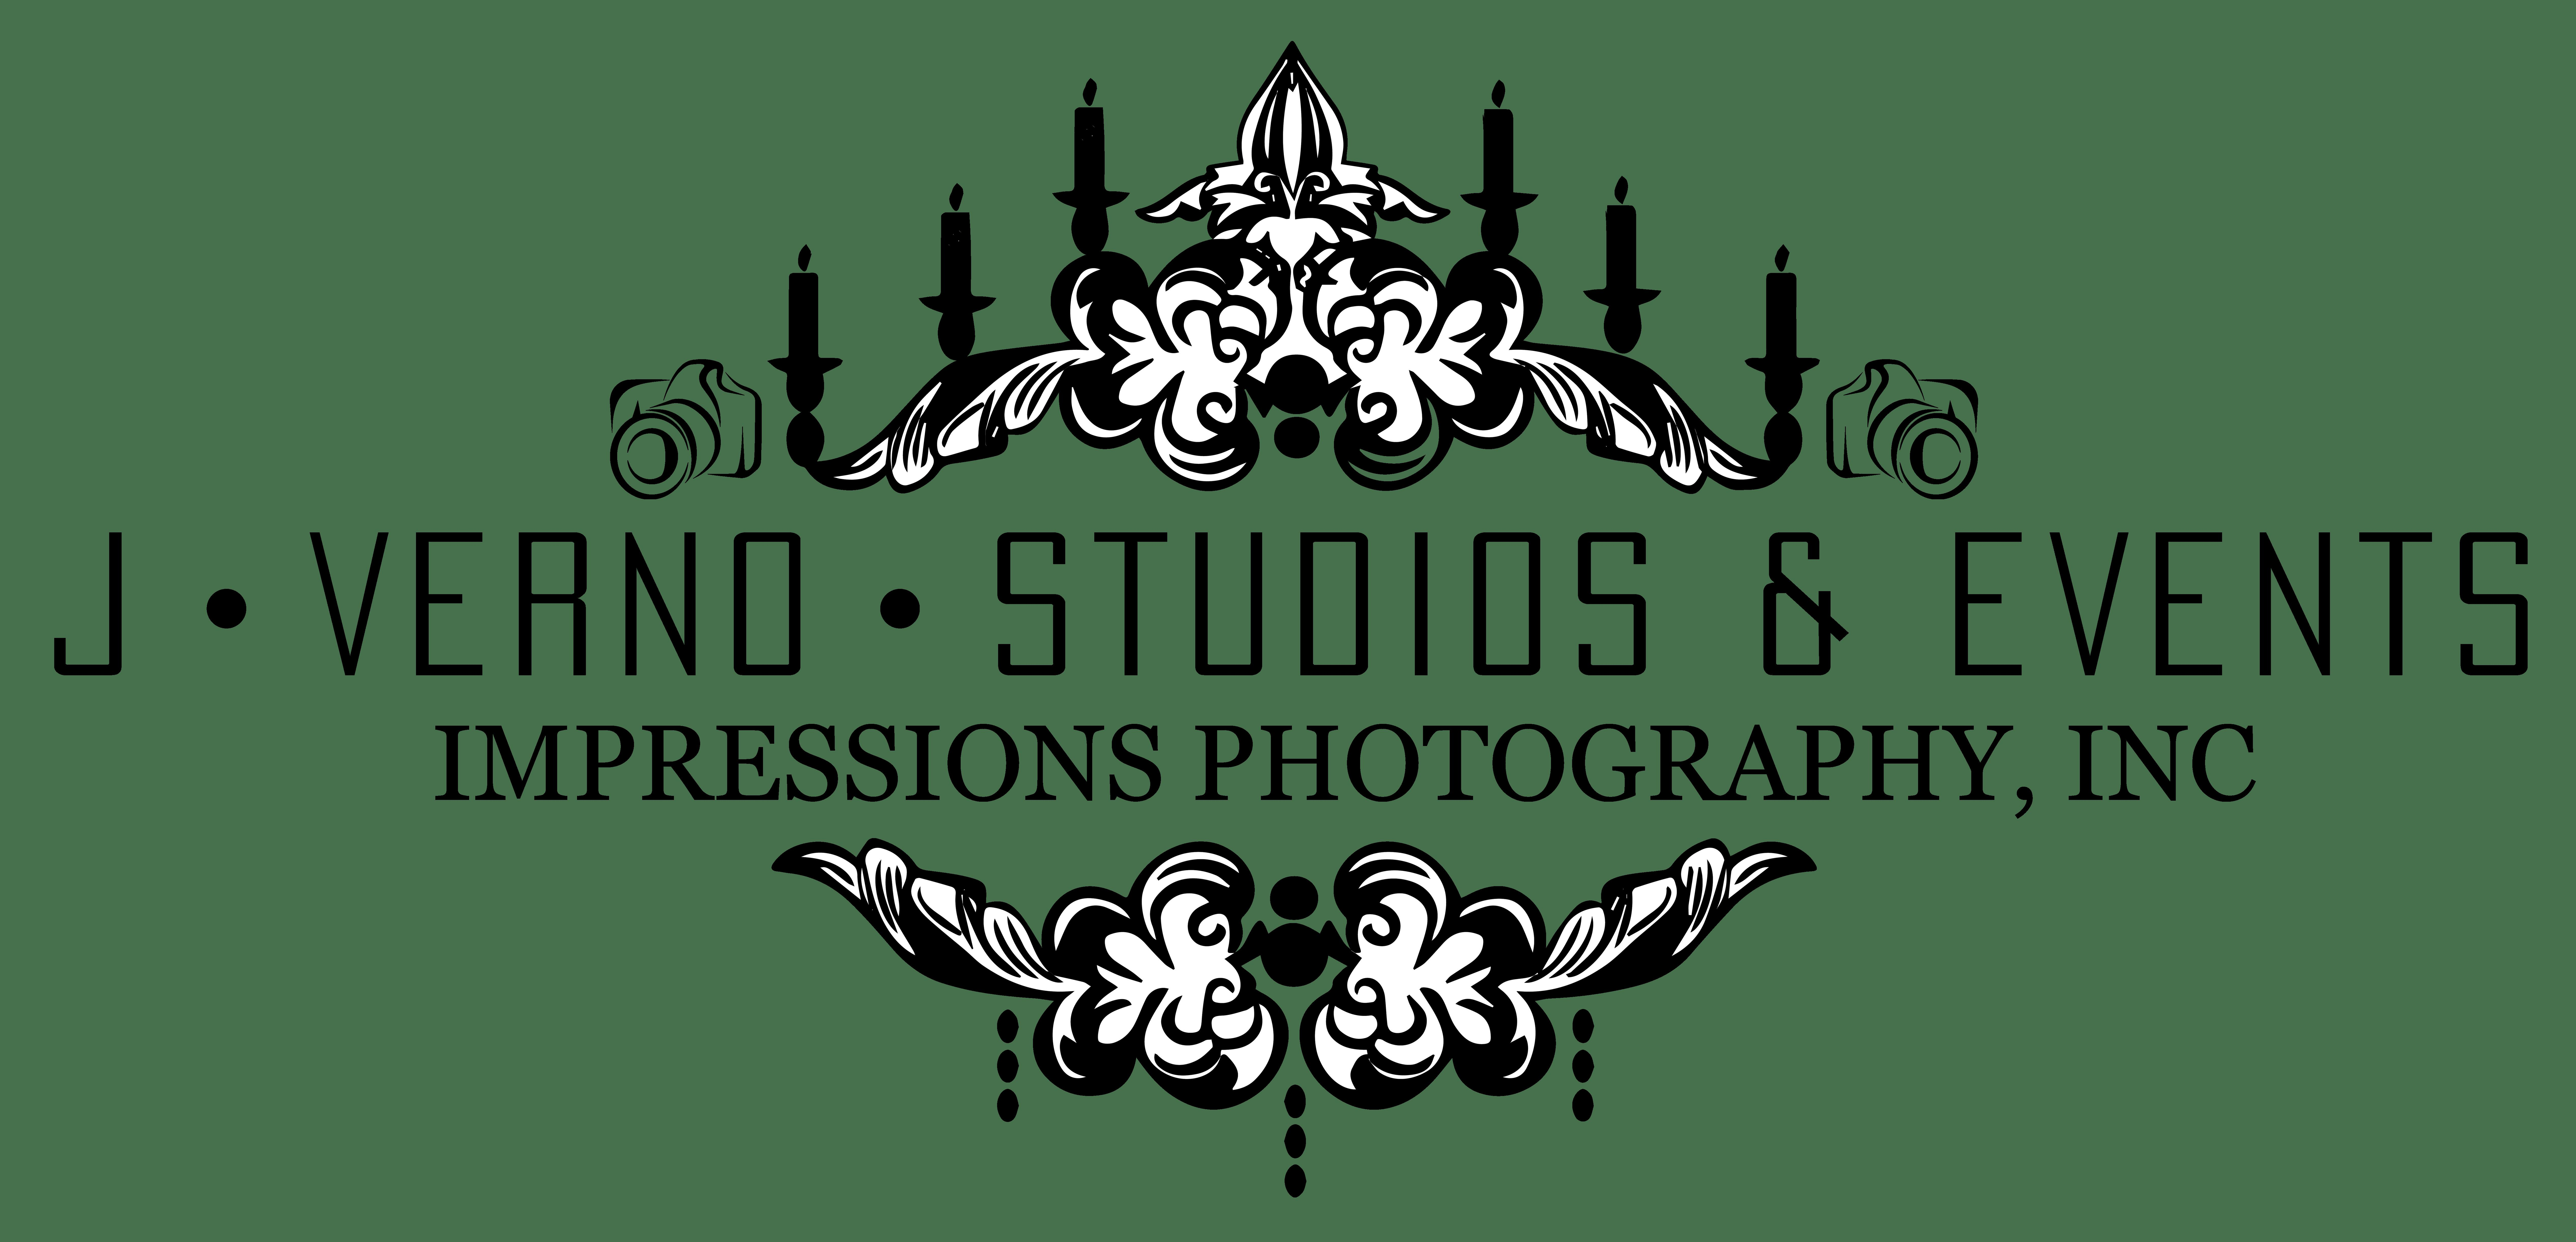 J. Verno Studios & Events